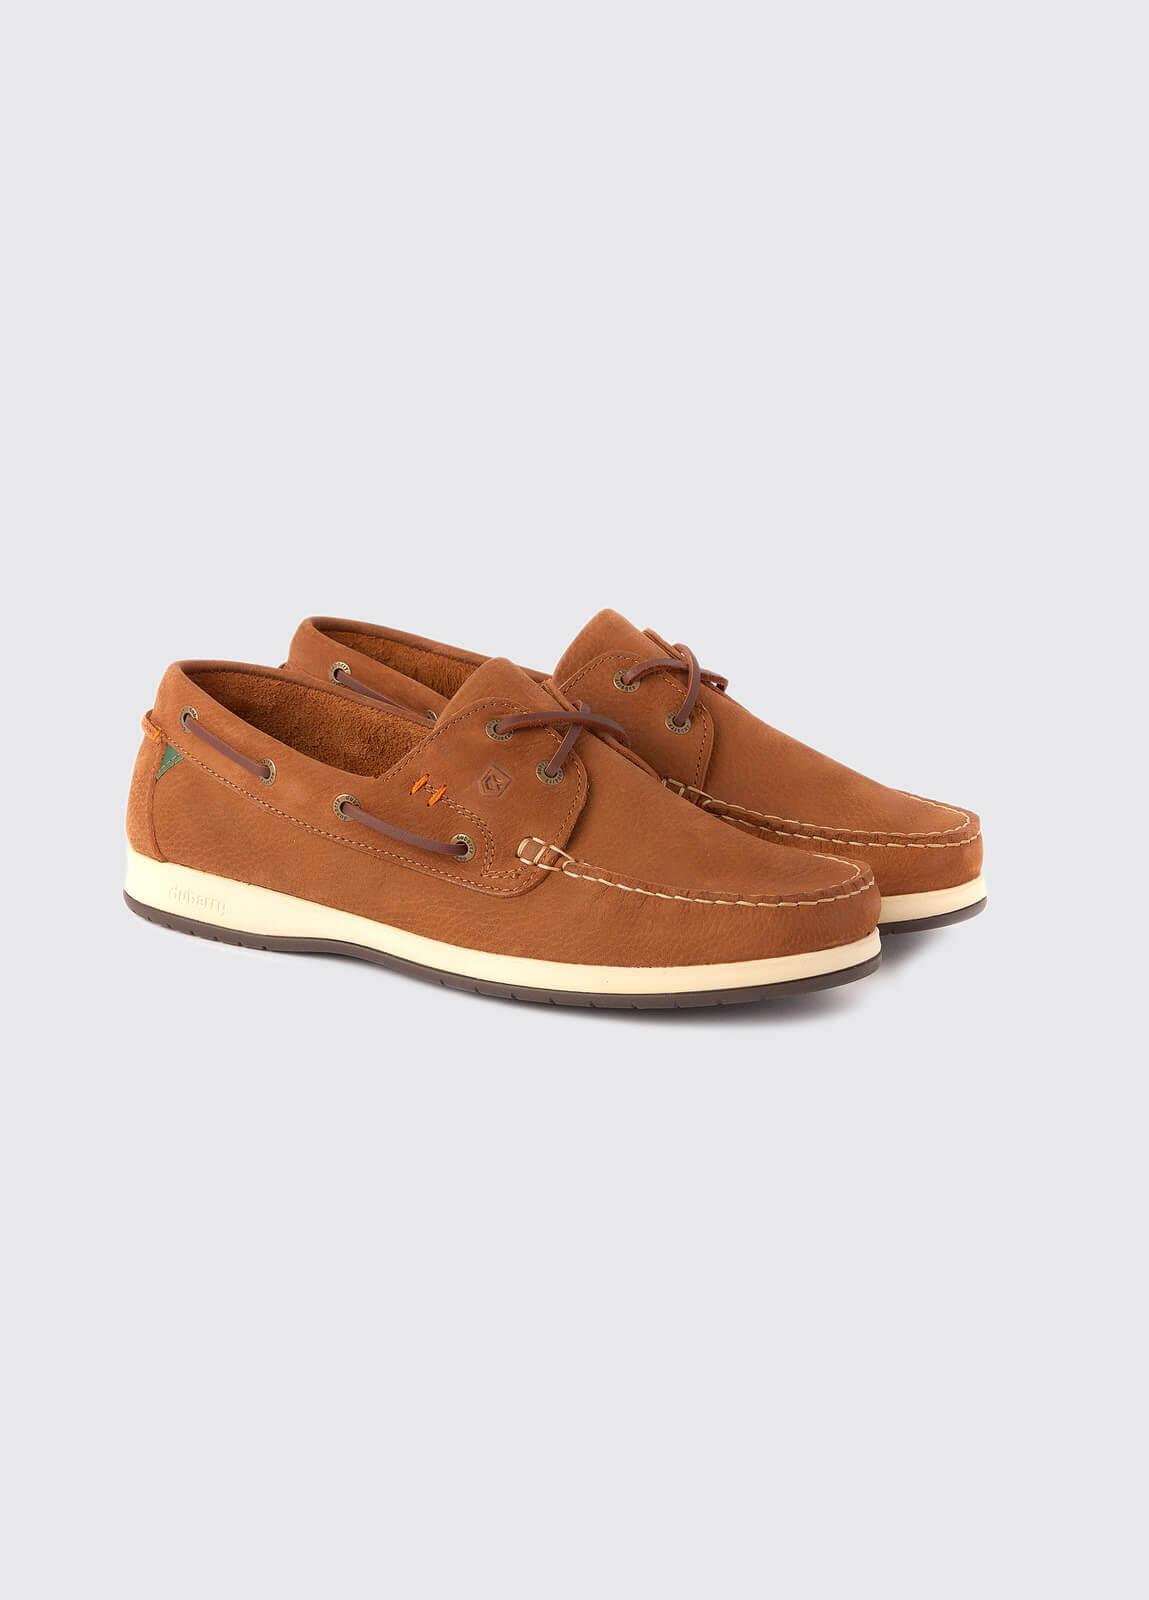 Armada X LT Deck shoes - Brown